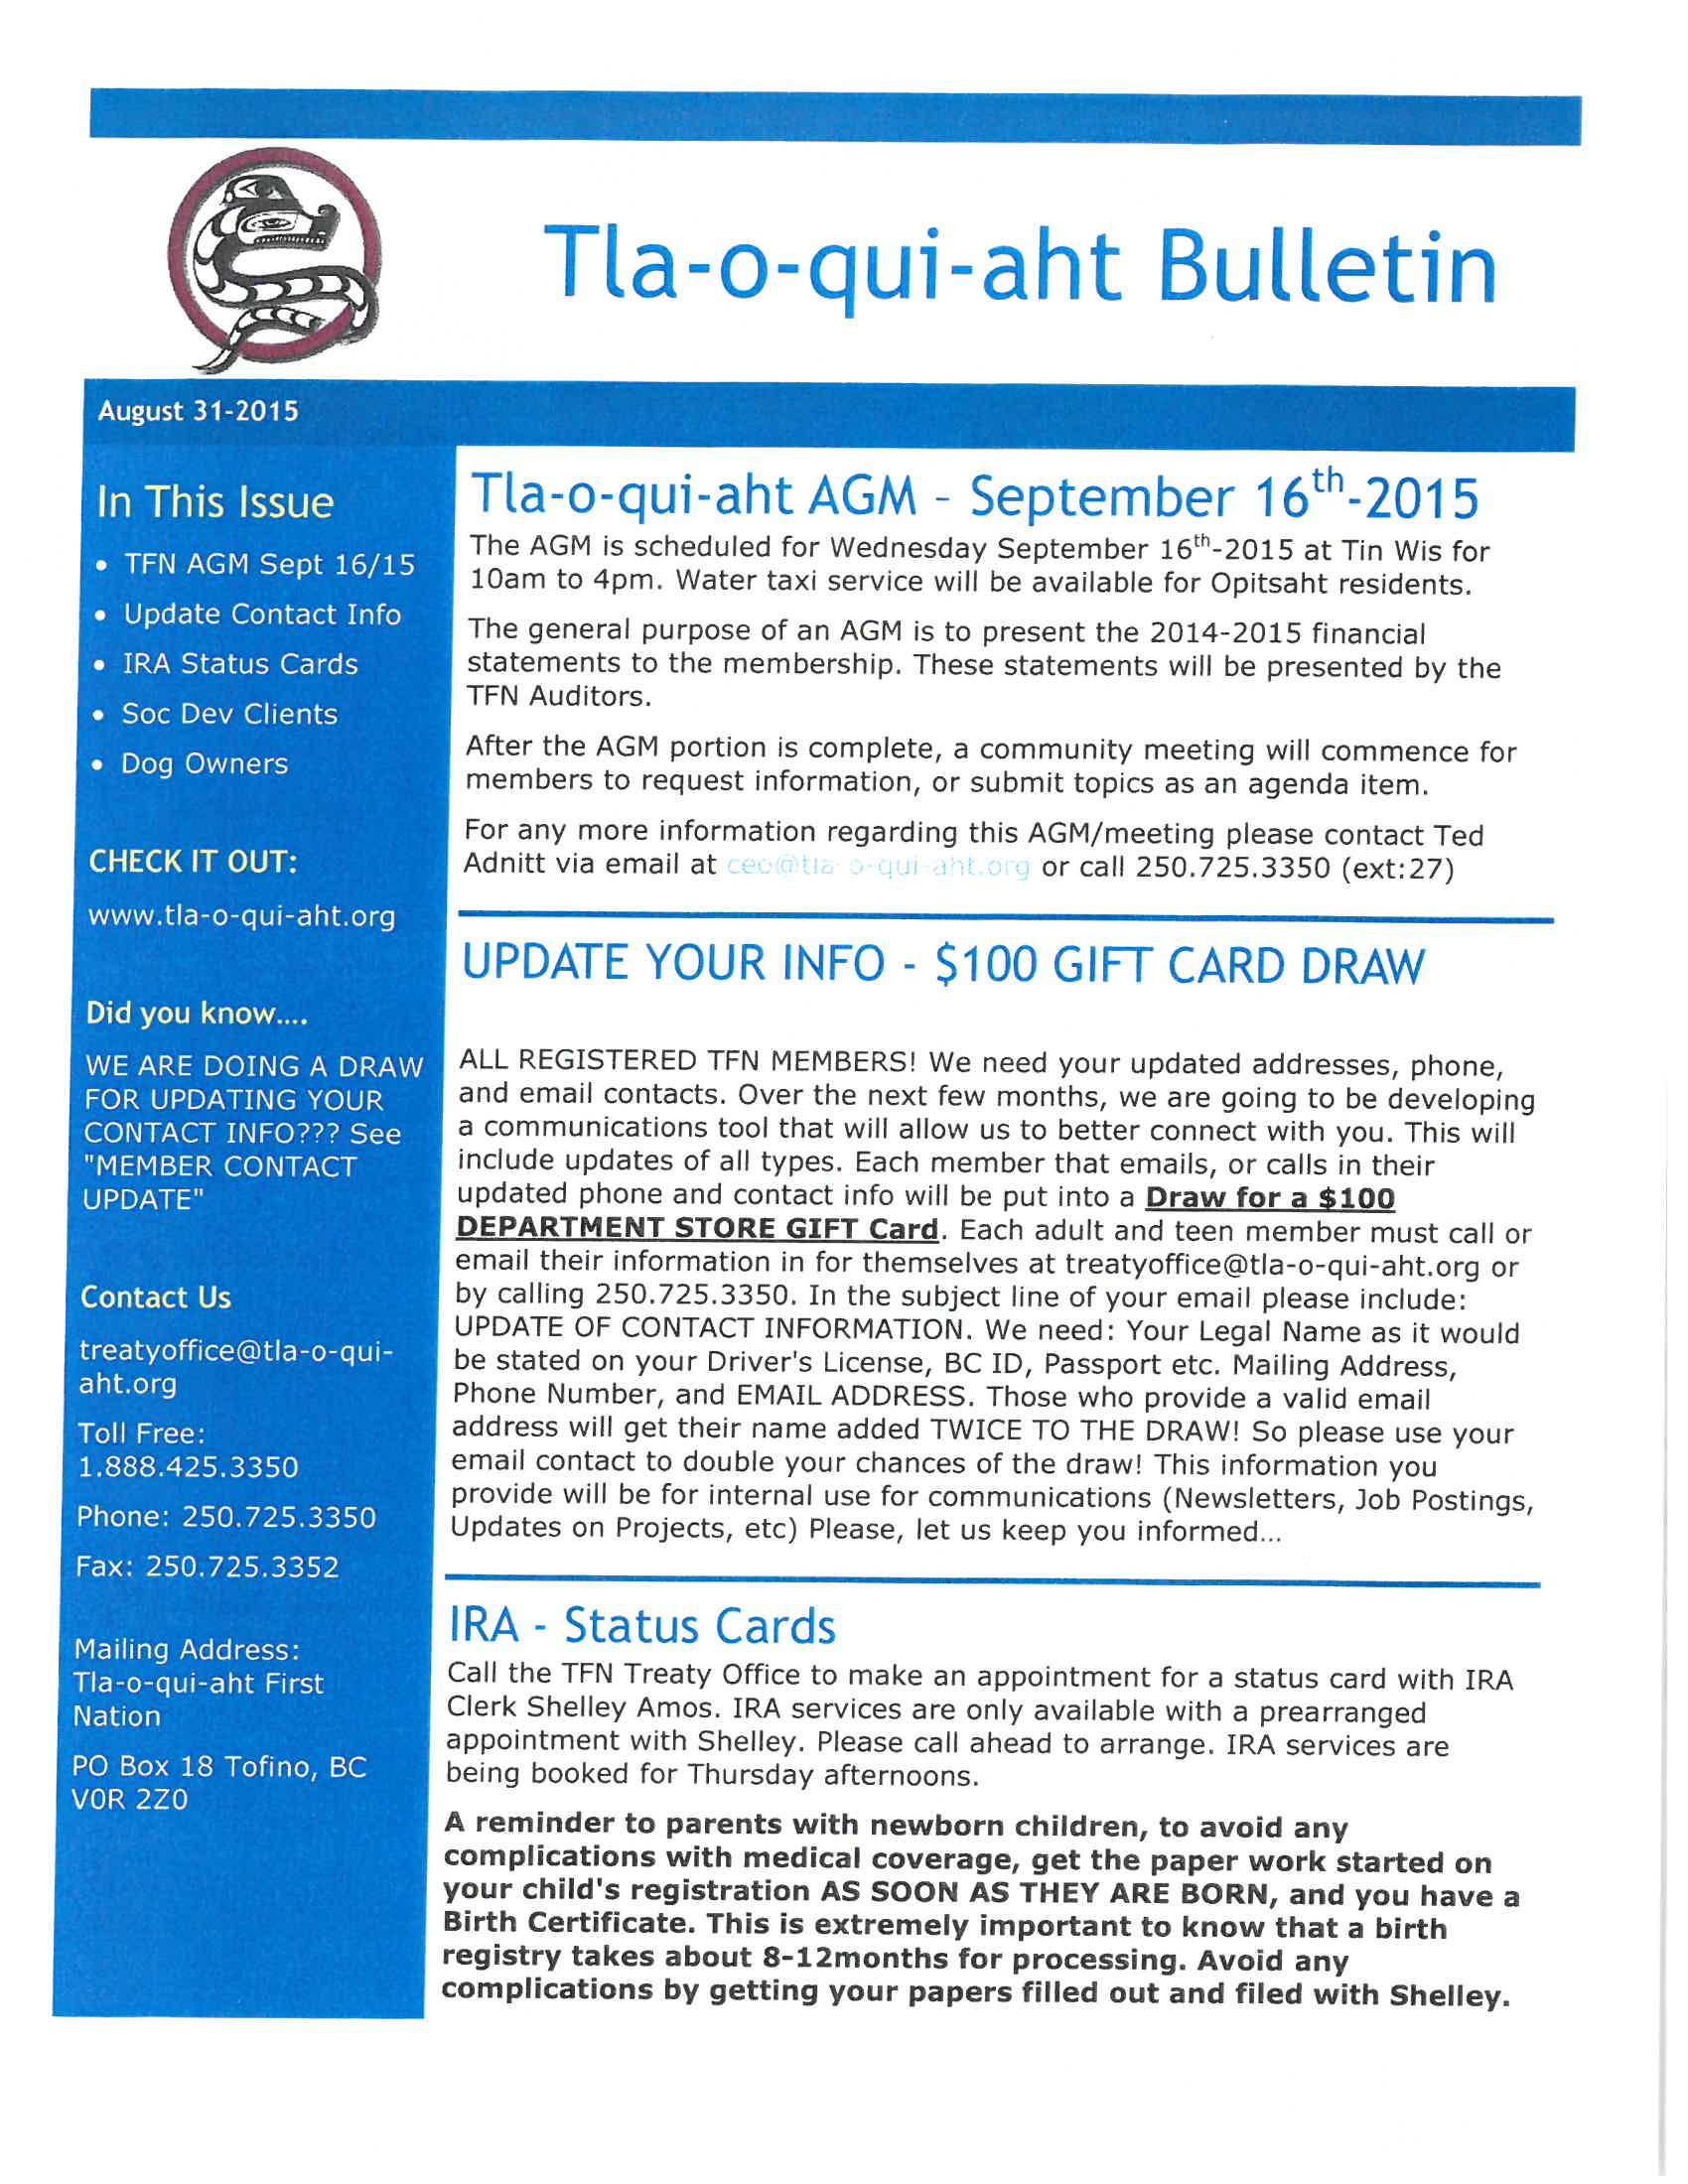 TFN_Bulletin_August_31_2015_Page_01.jpg